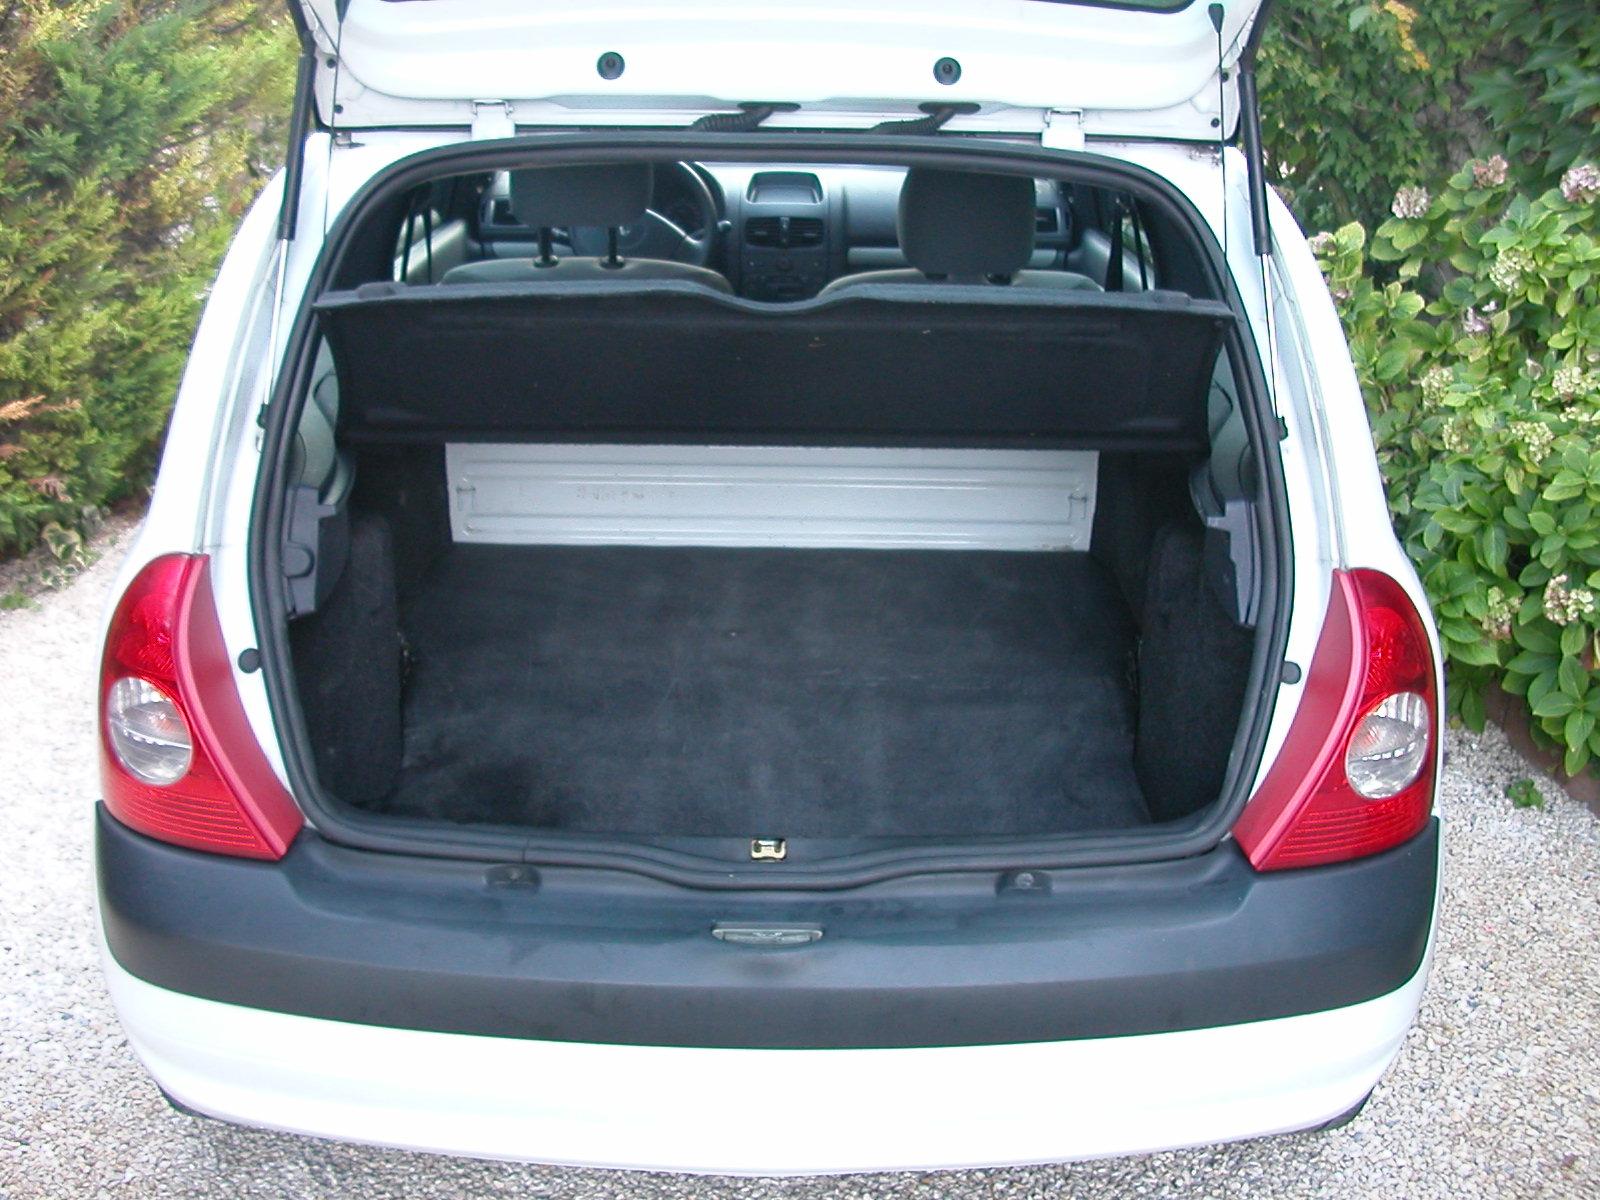 Tapis Coffre Renault Clio 2 Vinny Oleo Vegetal Info